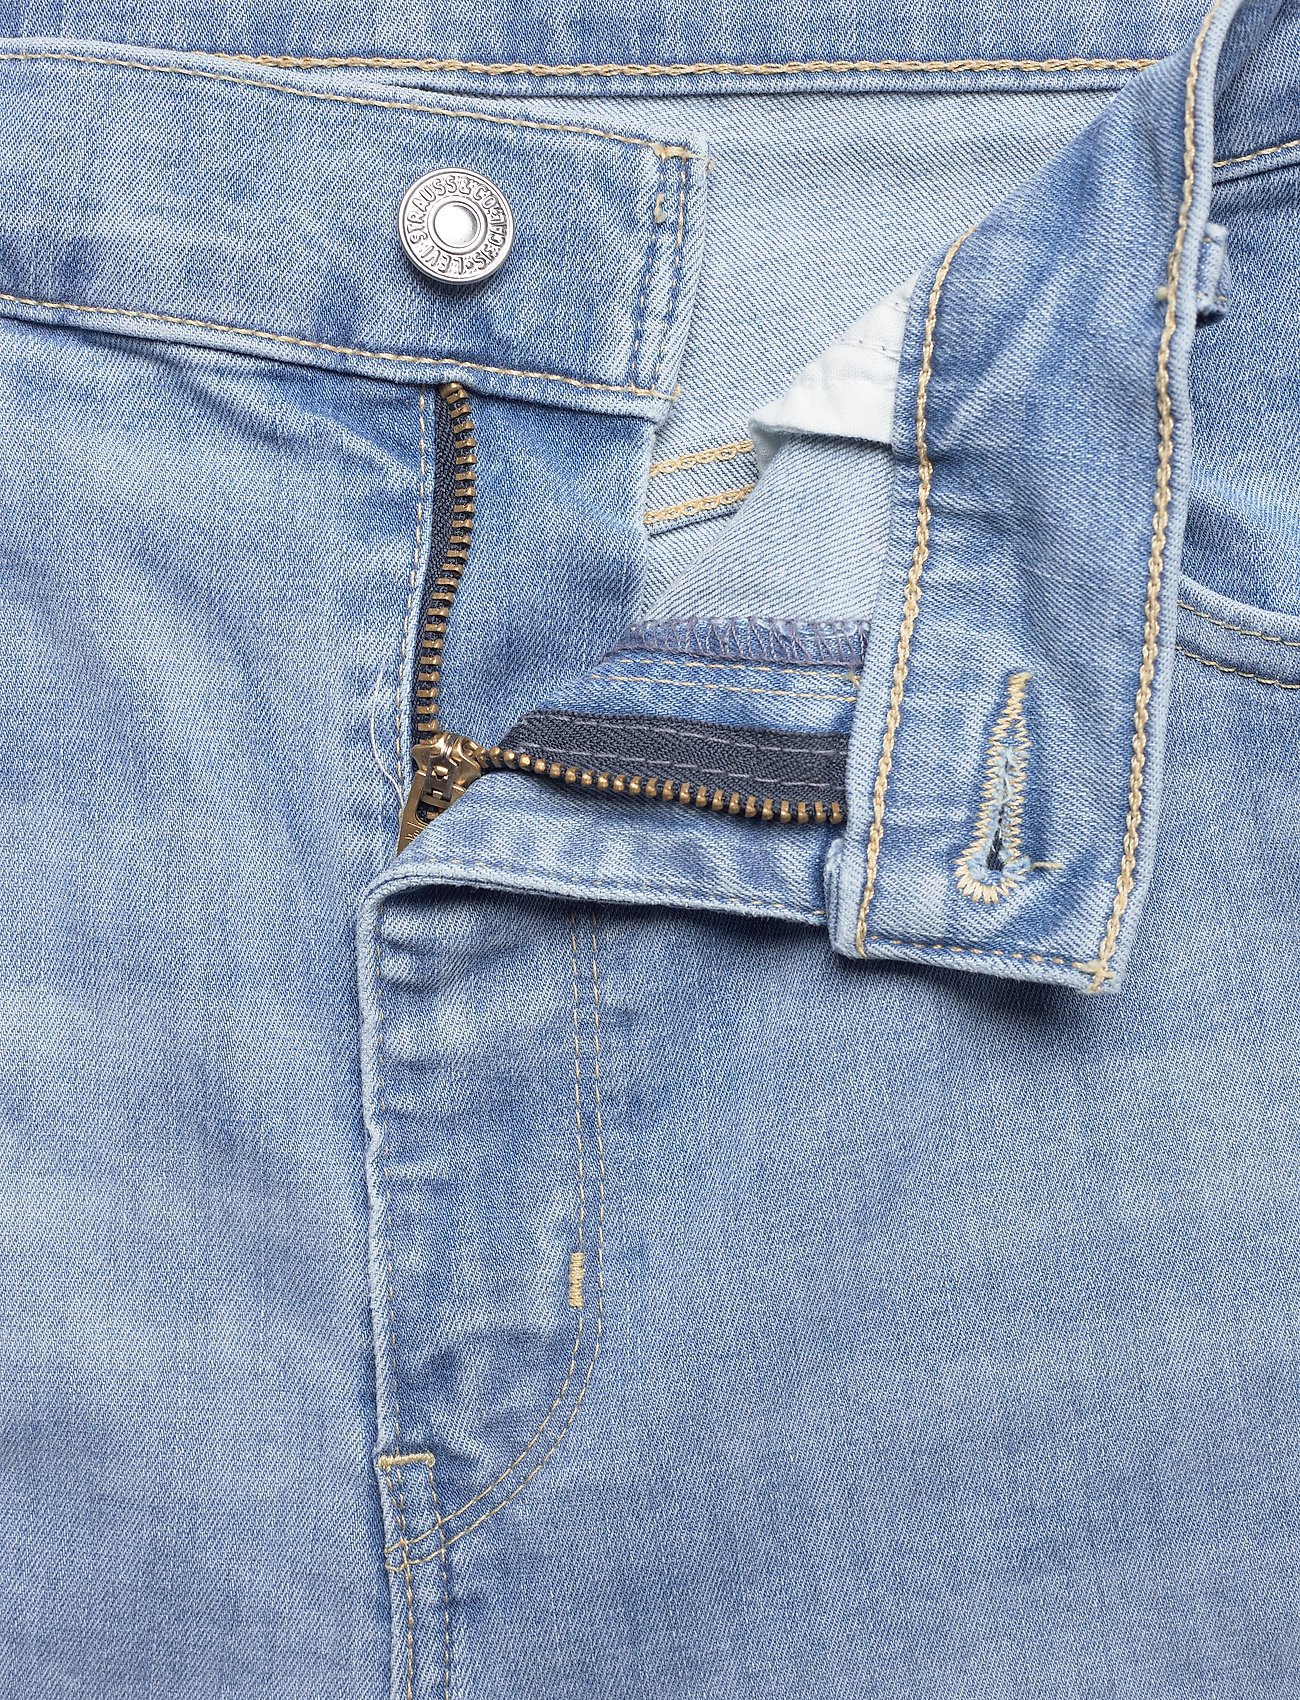 Levi's Plus Size - PLUS MILE HIGH SS GALAXY HAZY - skinny jeans - med indigo - worn in - 3